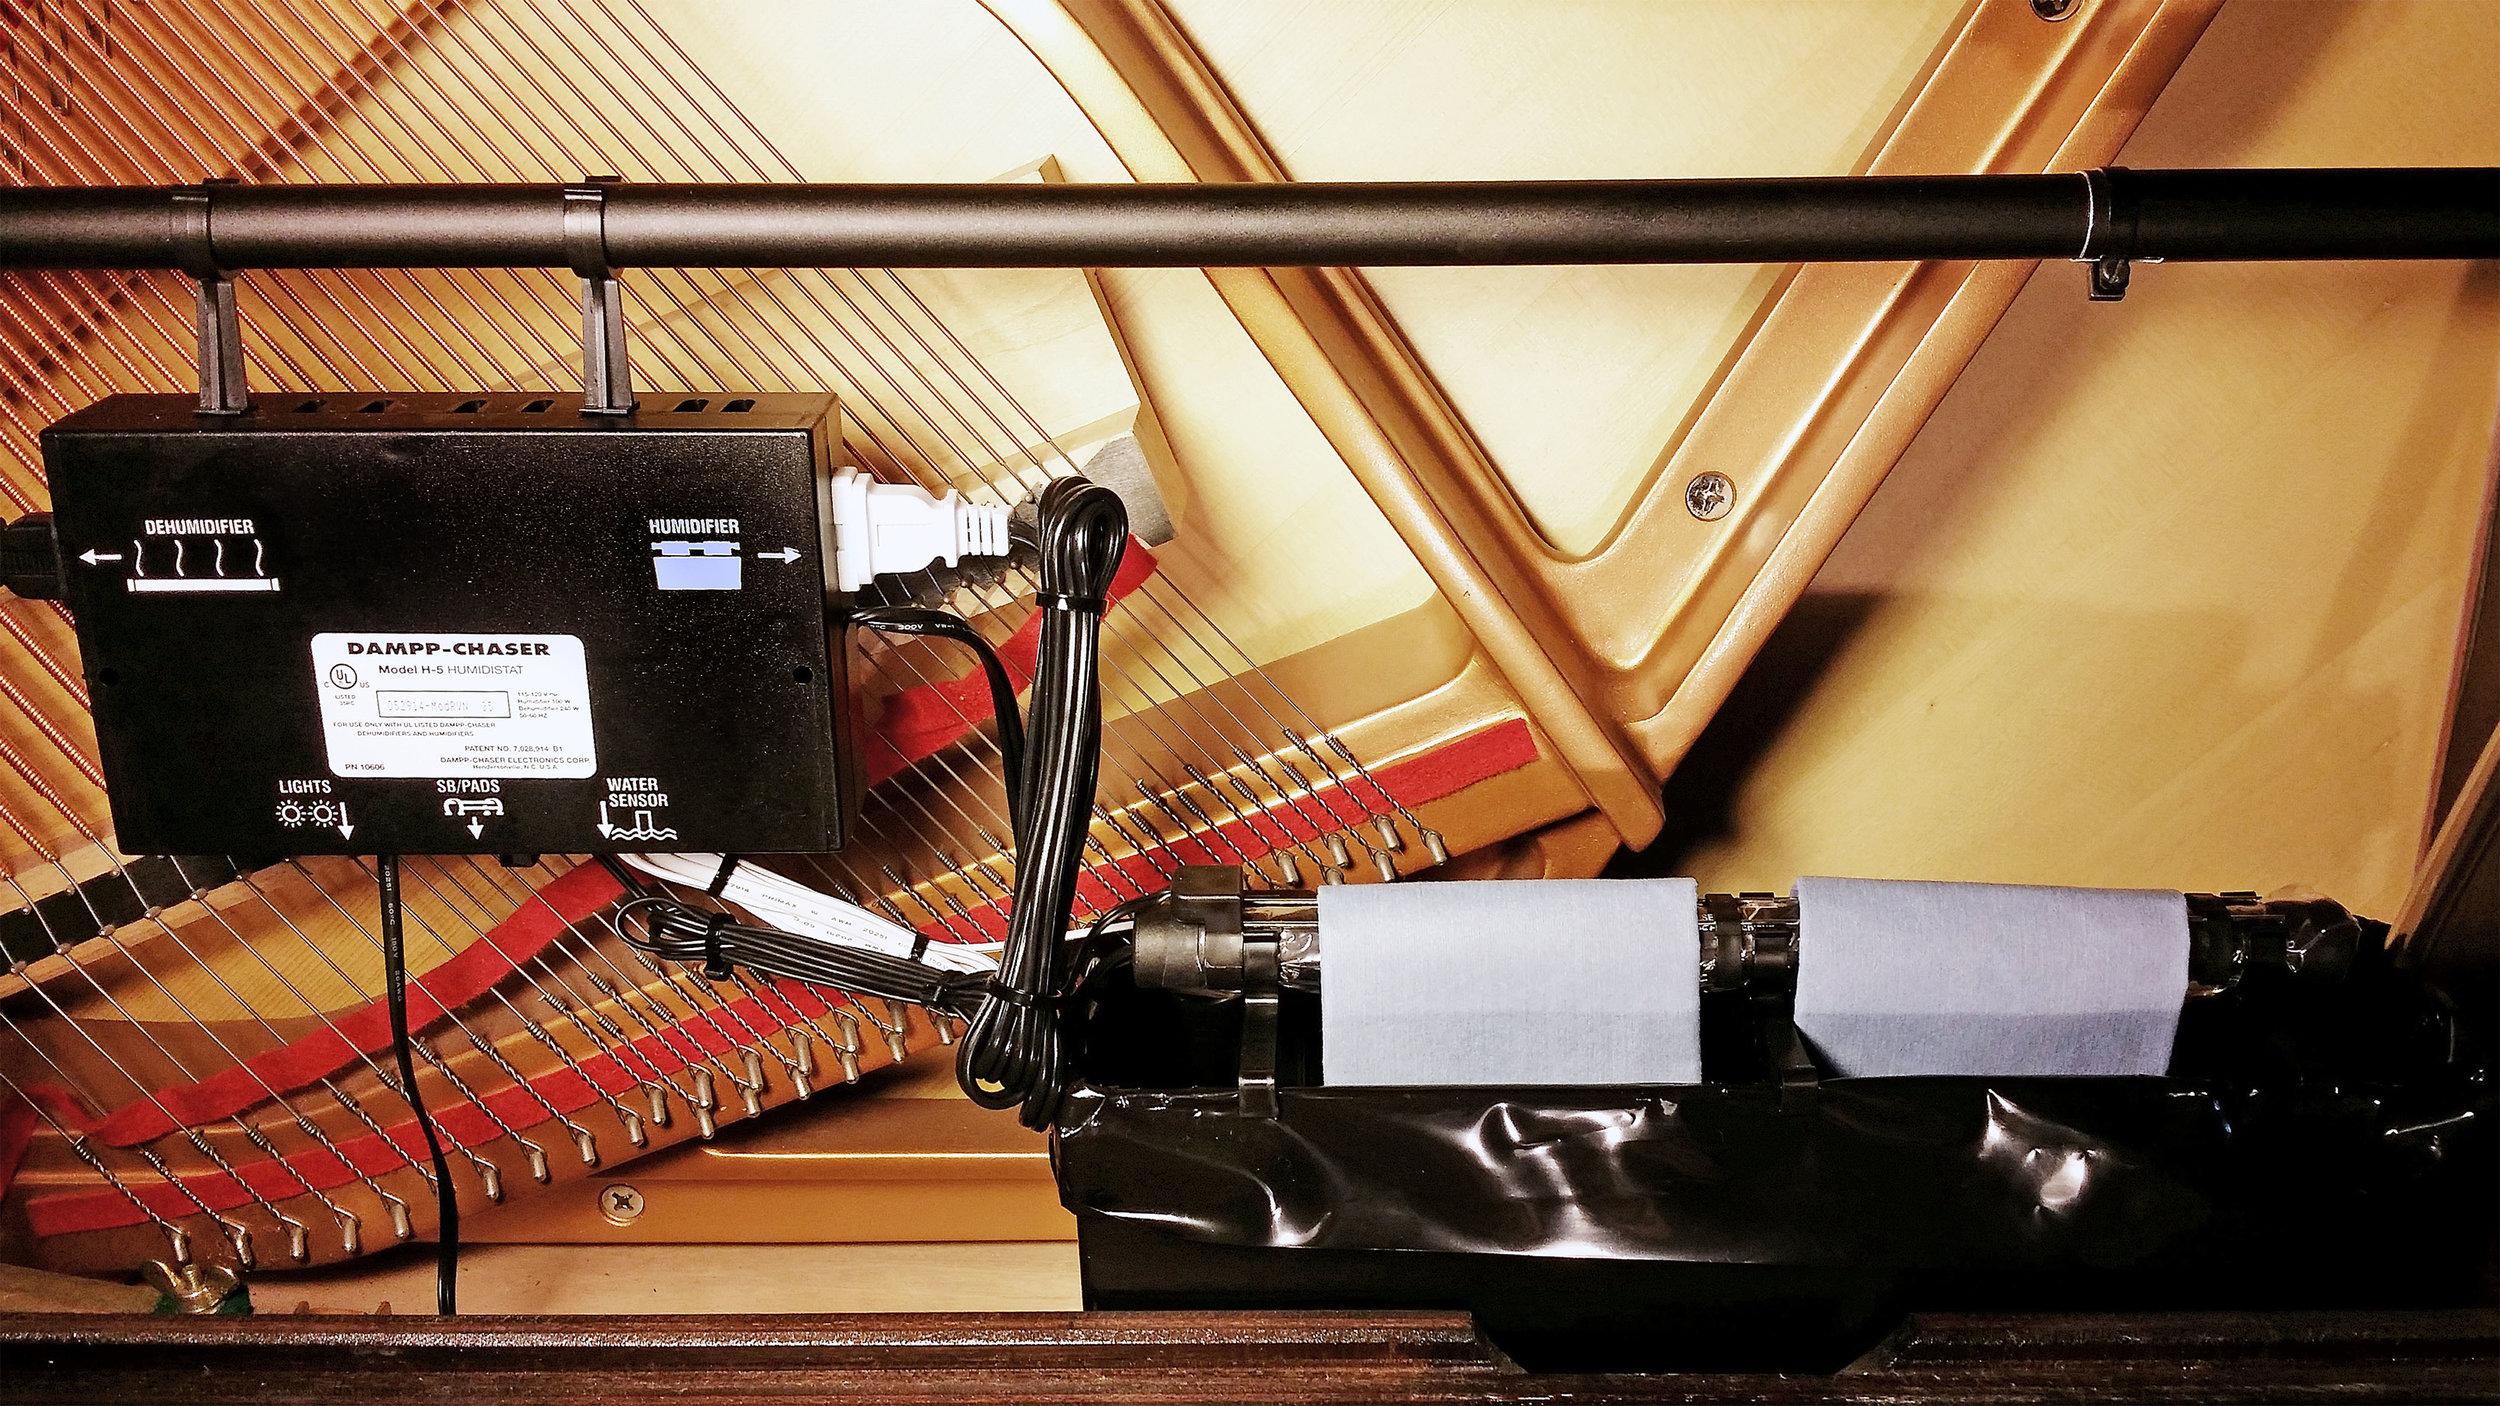 Dampp-Chaser Piano Lifesaver Upright Close Up